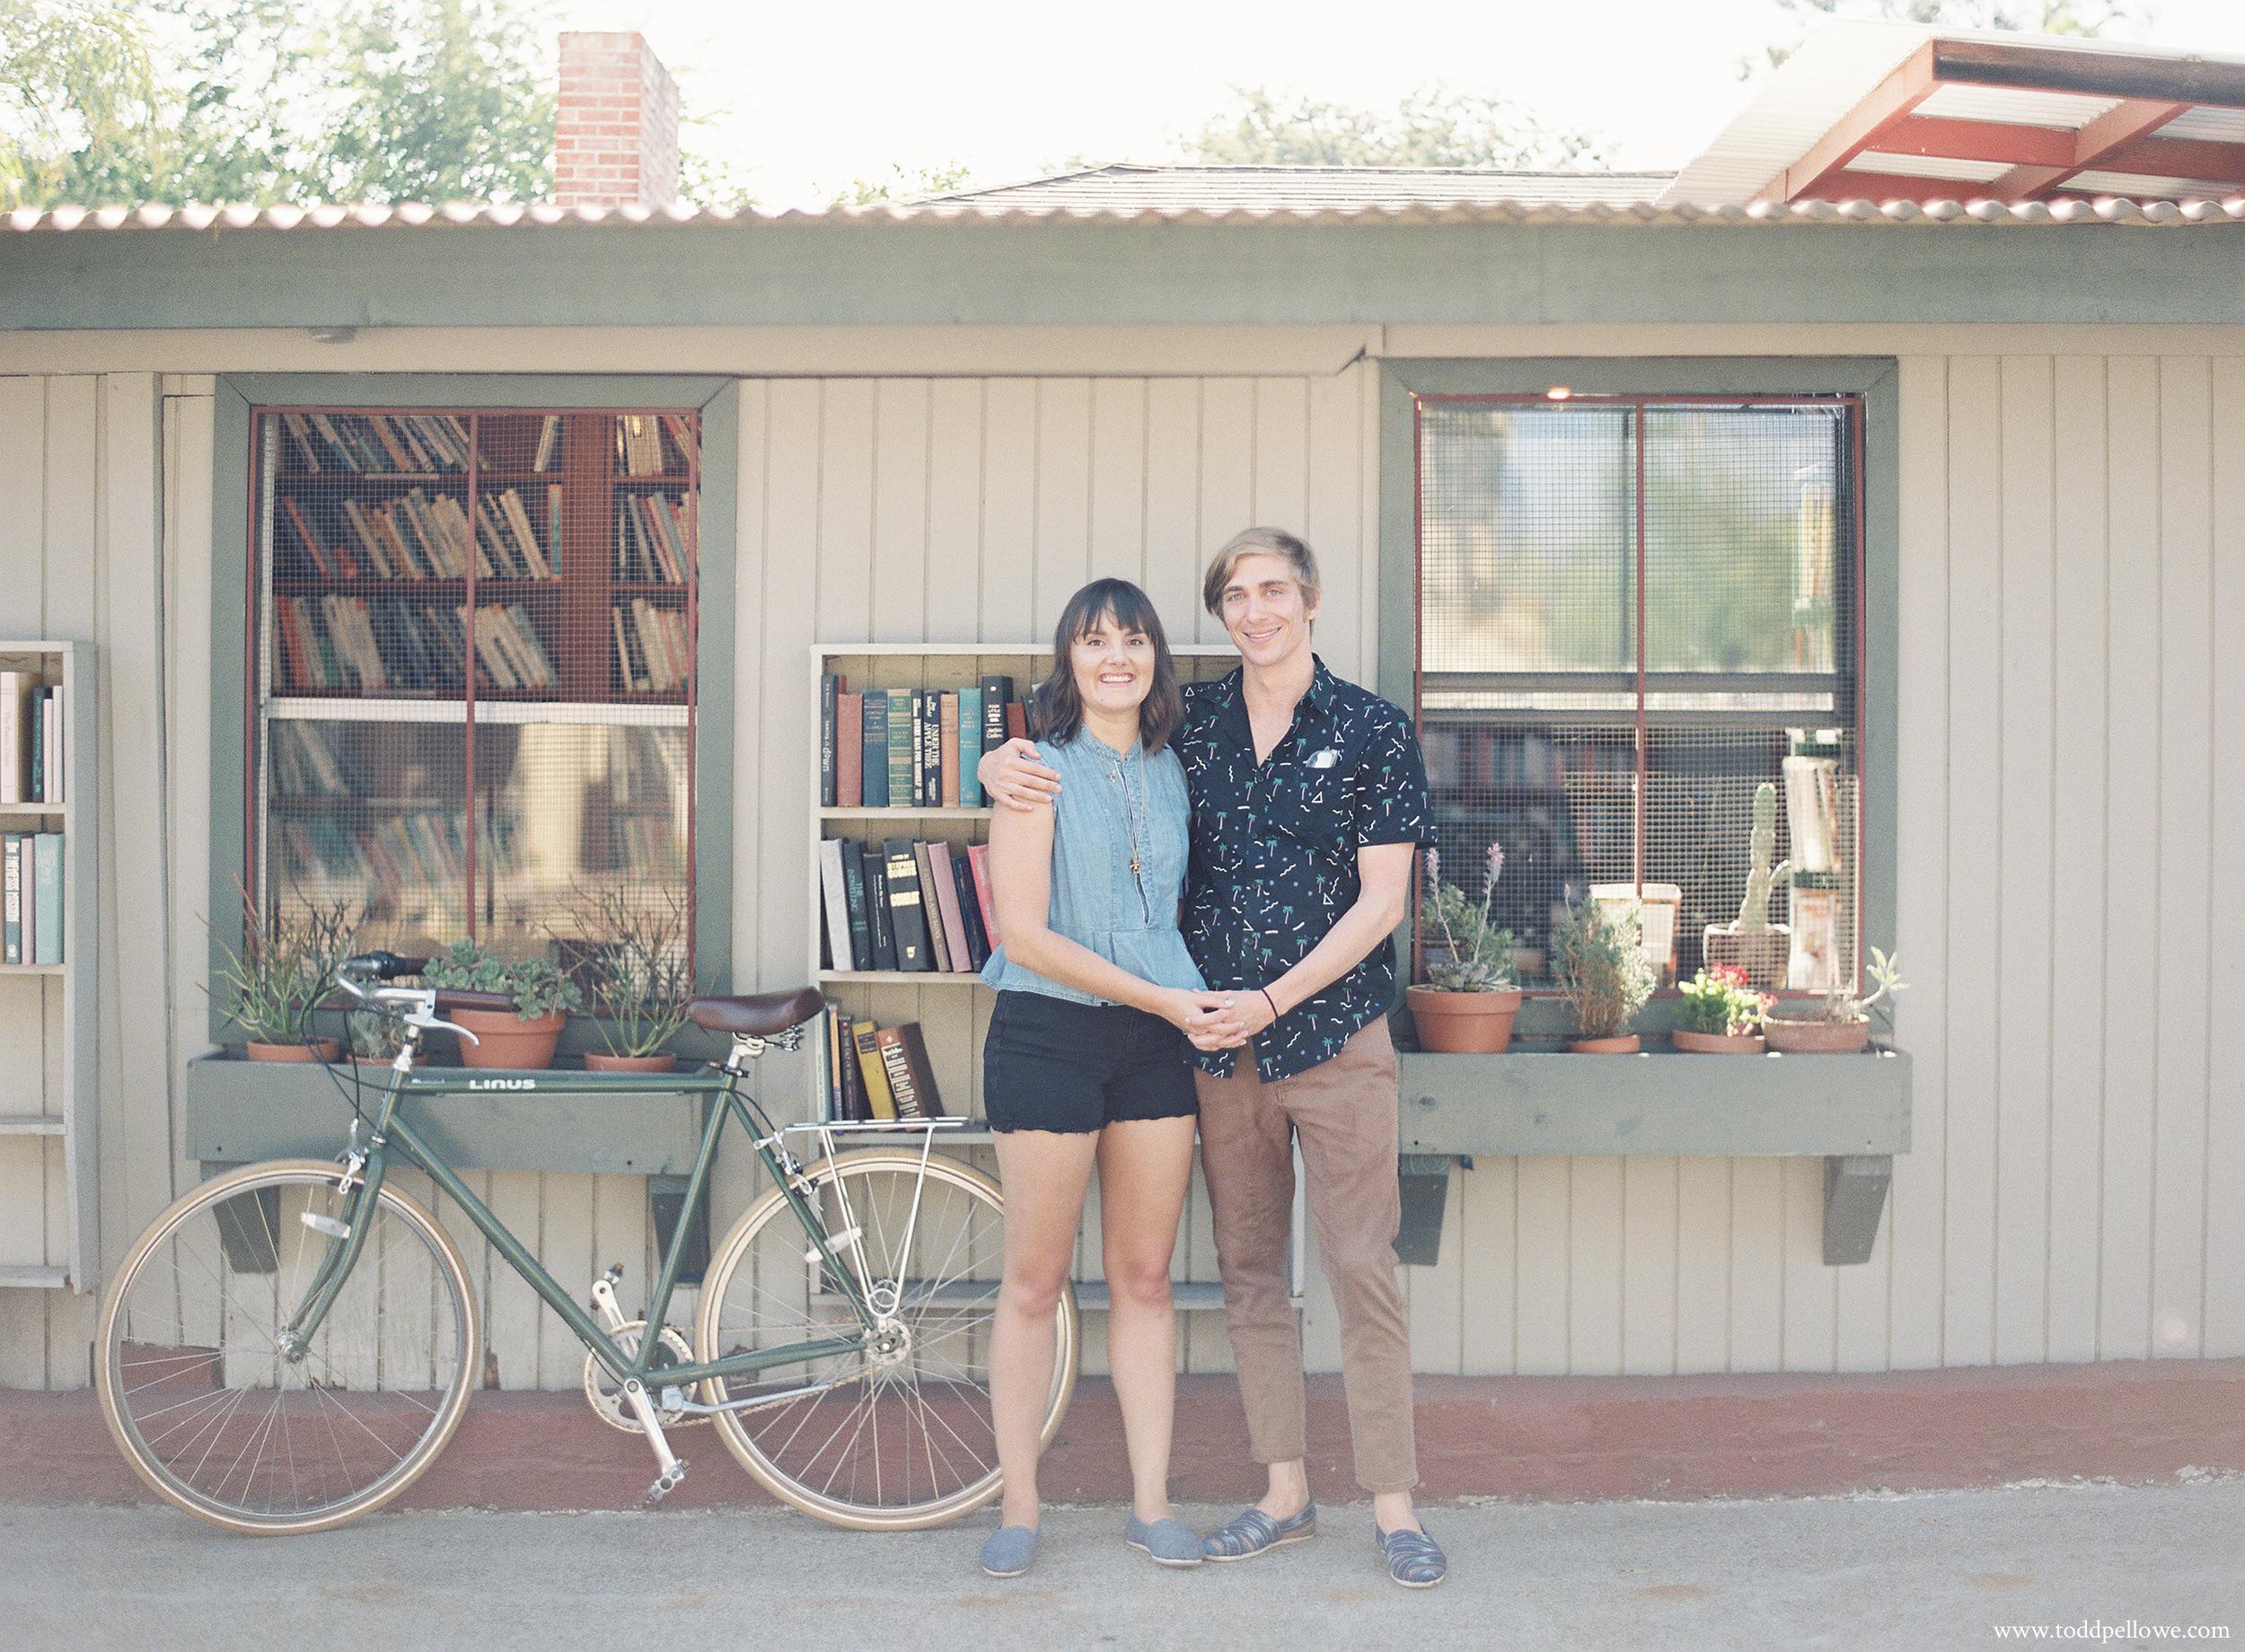 03-ojai-california-engagement-photography-002.jpg